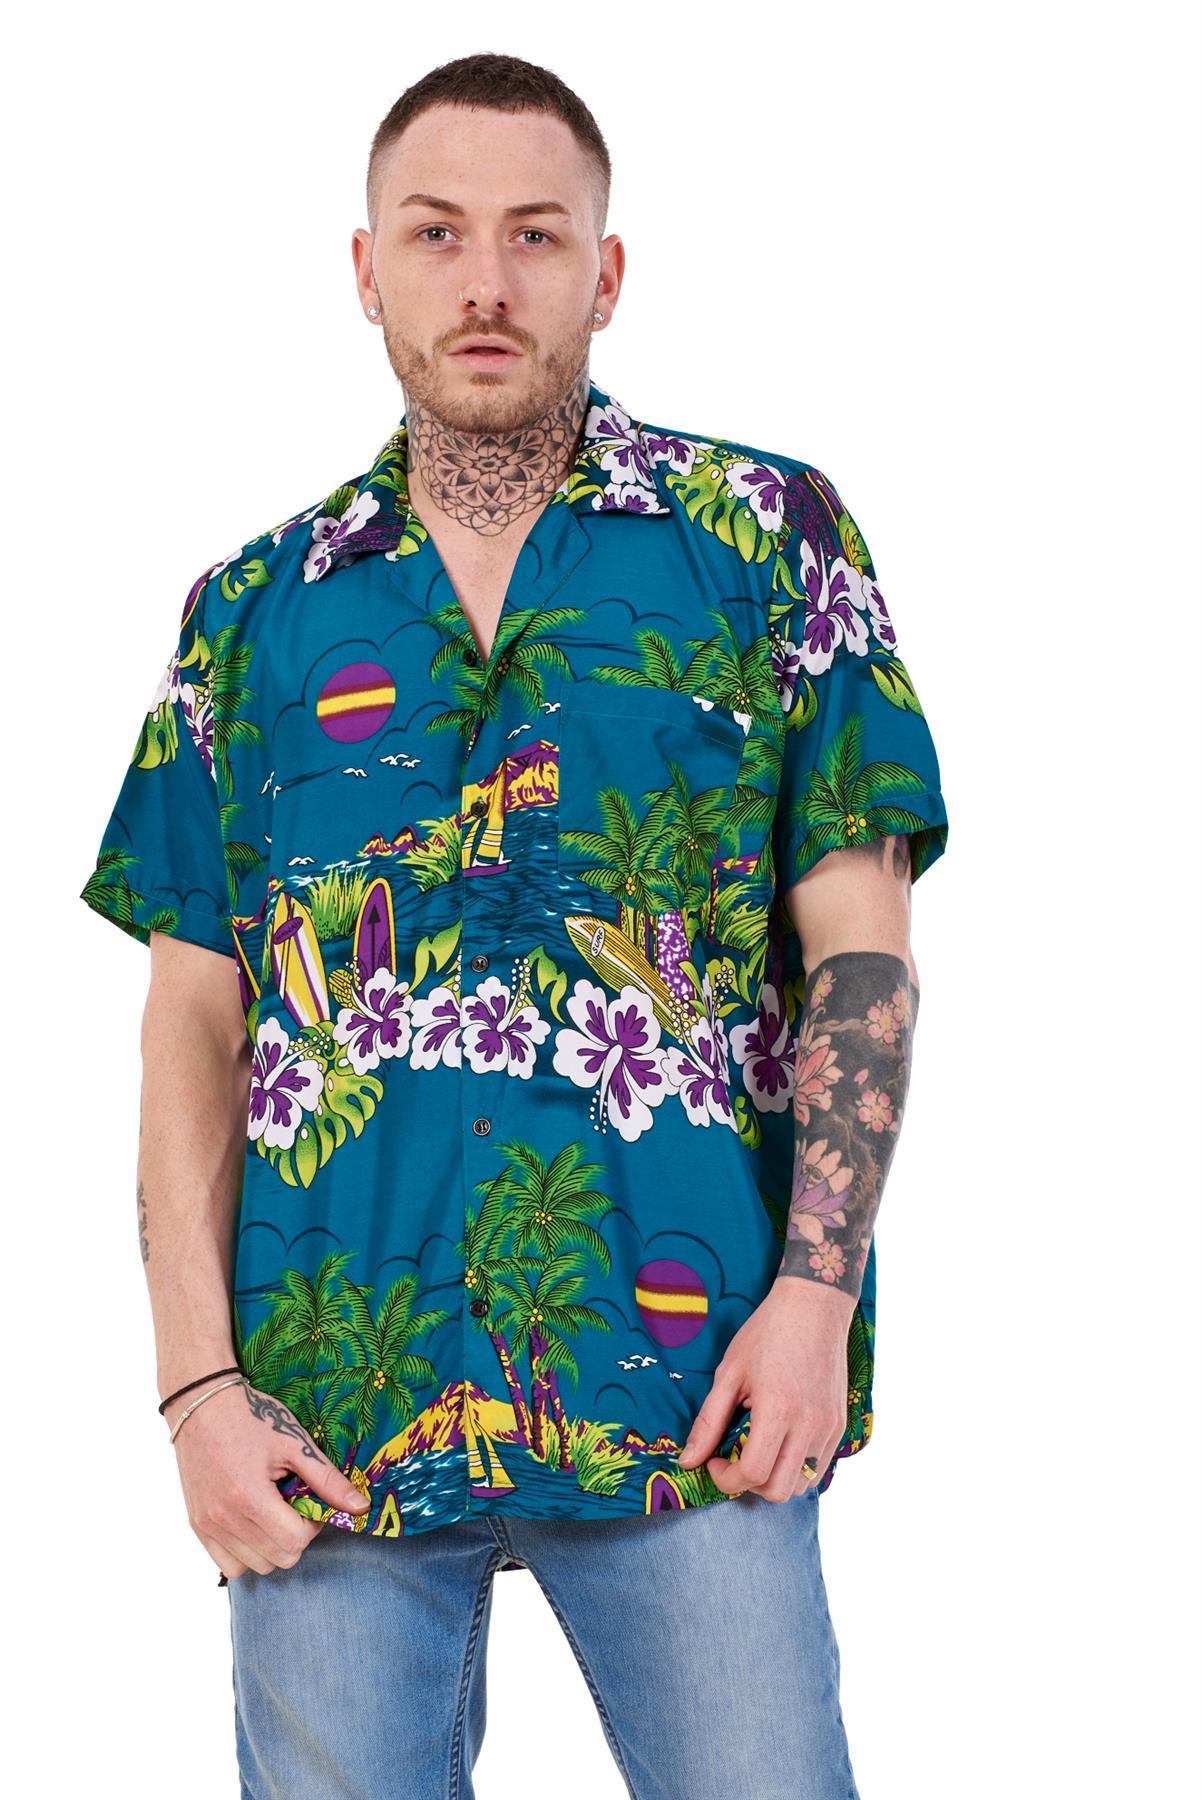 Mens-Hawaiian-Shirt-Multi-Colors-Print-Regular-Big-Size-Summer-Fancy-Dress-M-5XL thumbnail 8